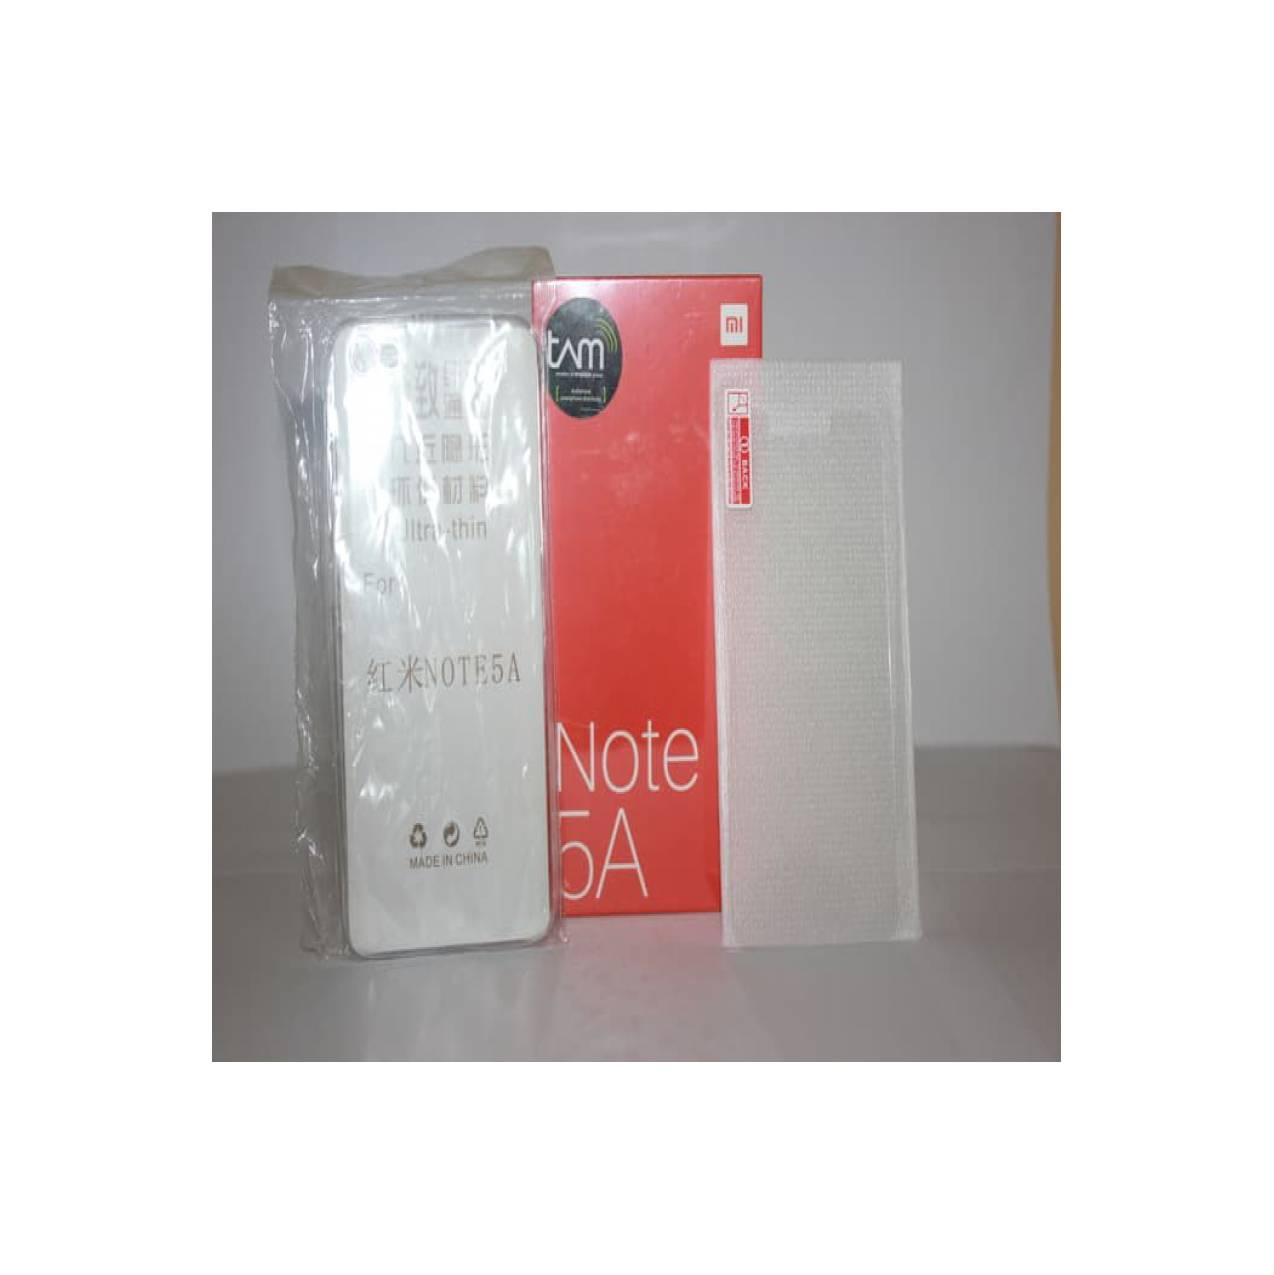 Xiaomi Redmi Note 5A 2-16 Grs RESMI 1 Tahun PT TAM Free Case Dan Tempe